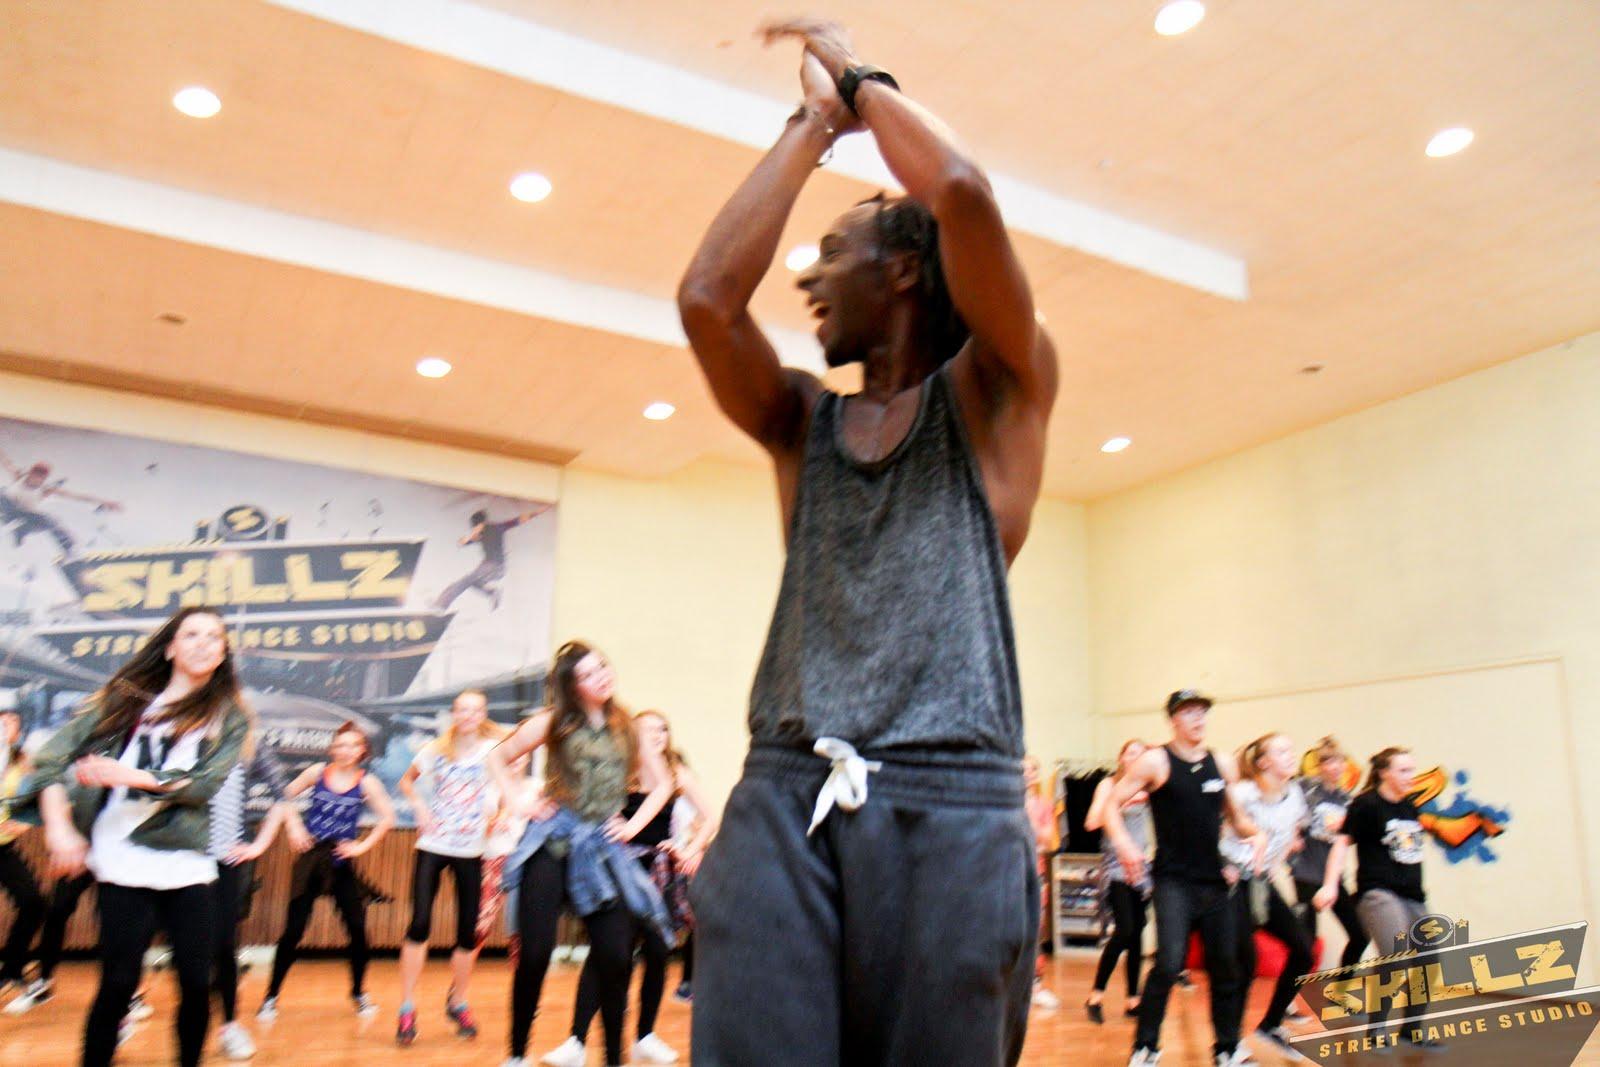 Dancehall workshop with Camron One Shot - IMG_7755.jpg